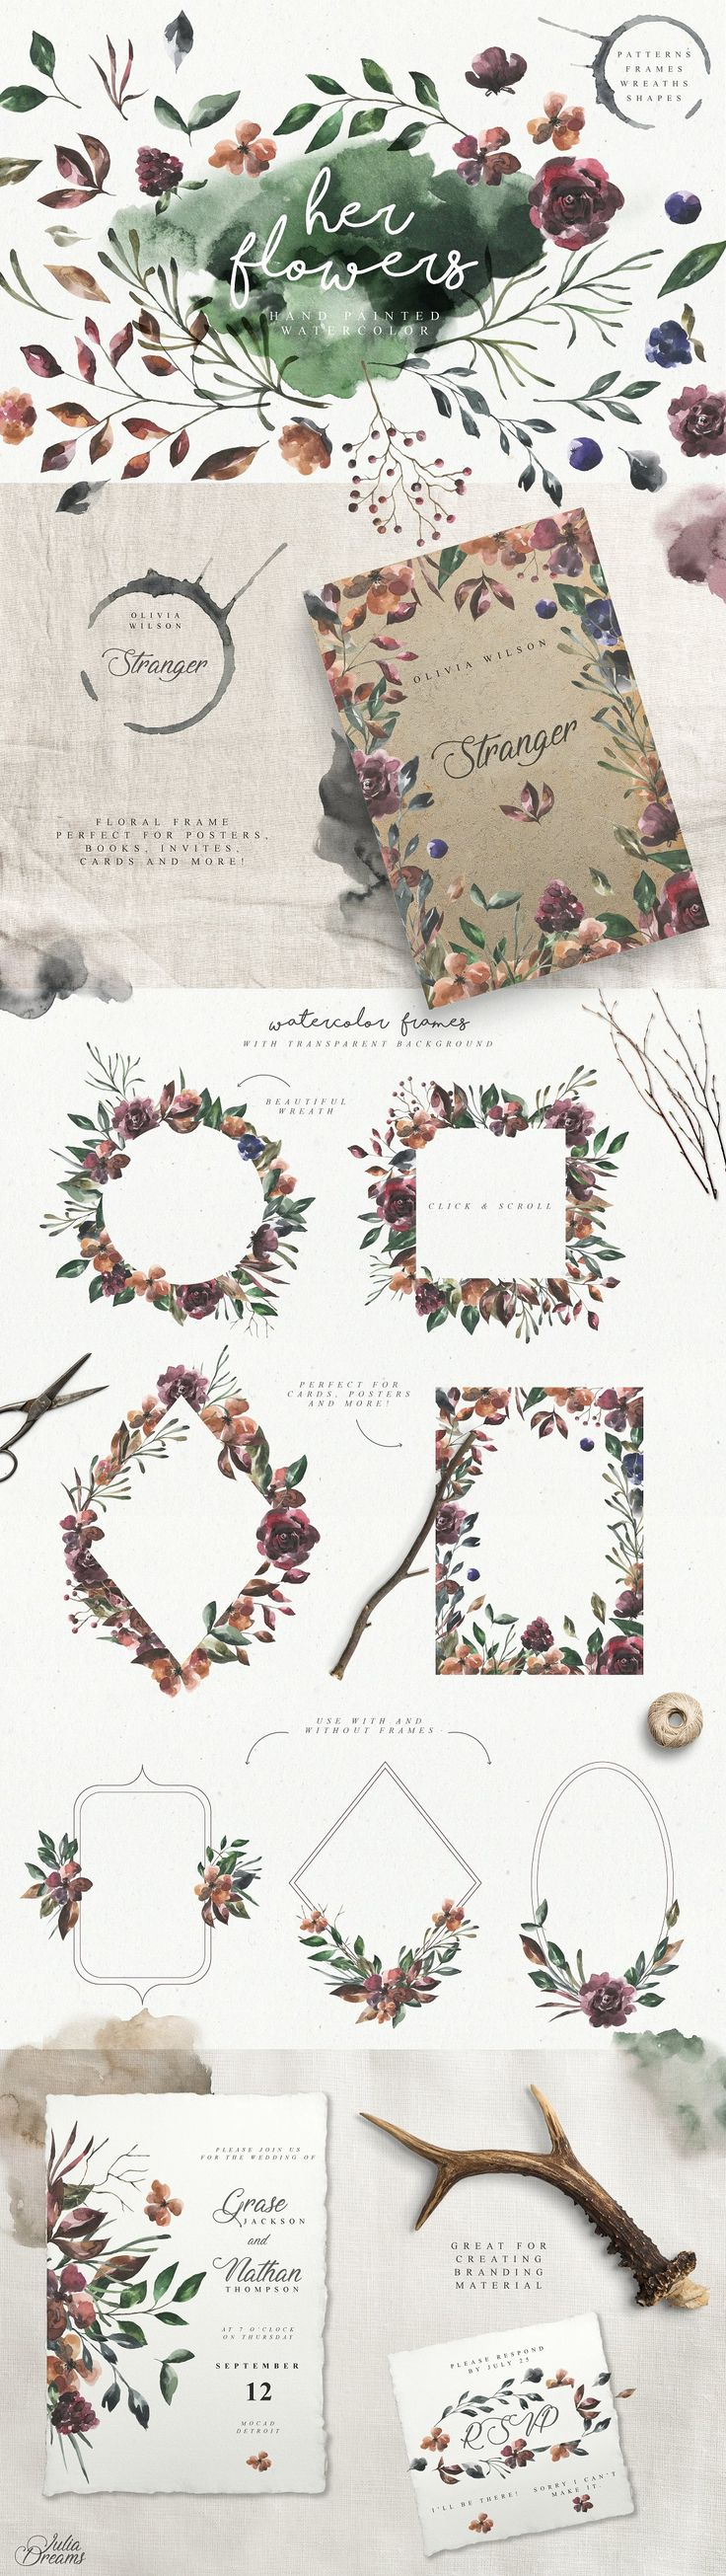 Her Flowers by Julia Dreams on @creativemarket #watercolor #flowers #wintery